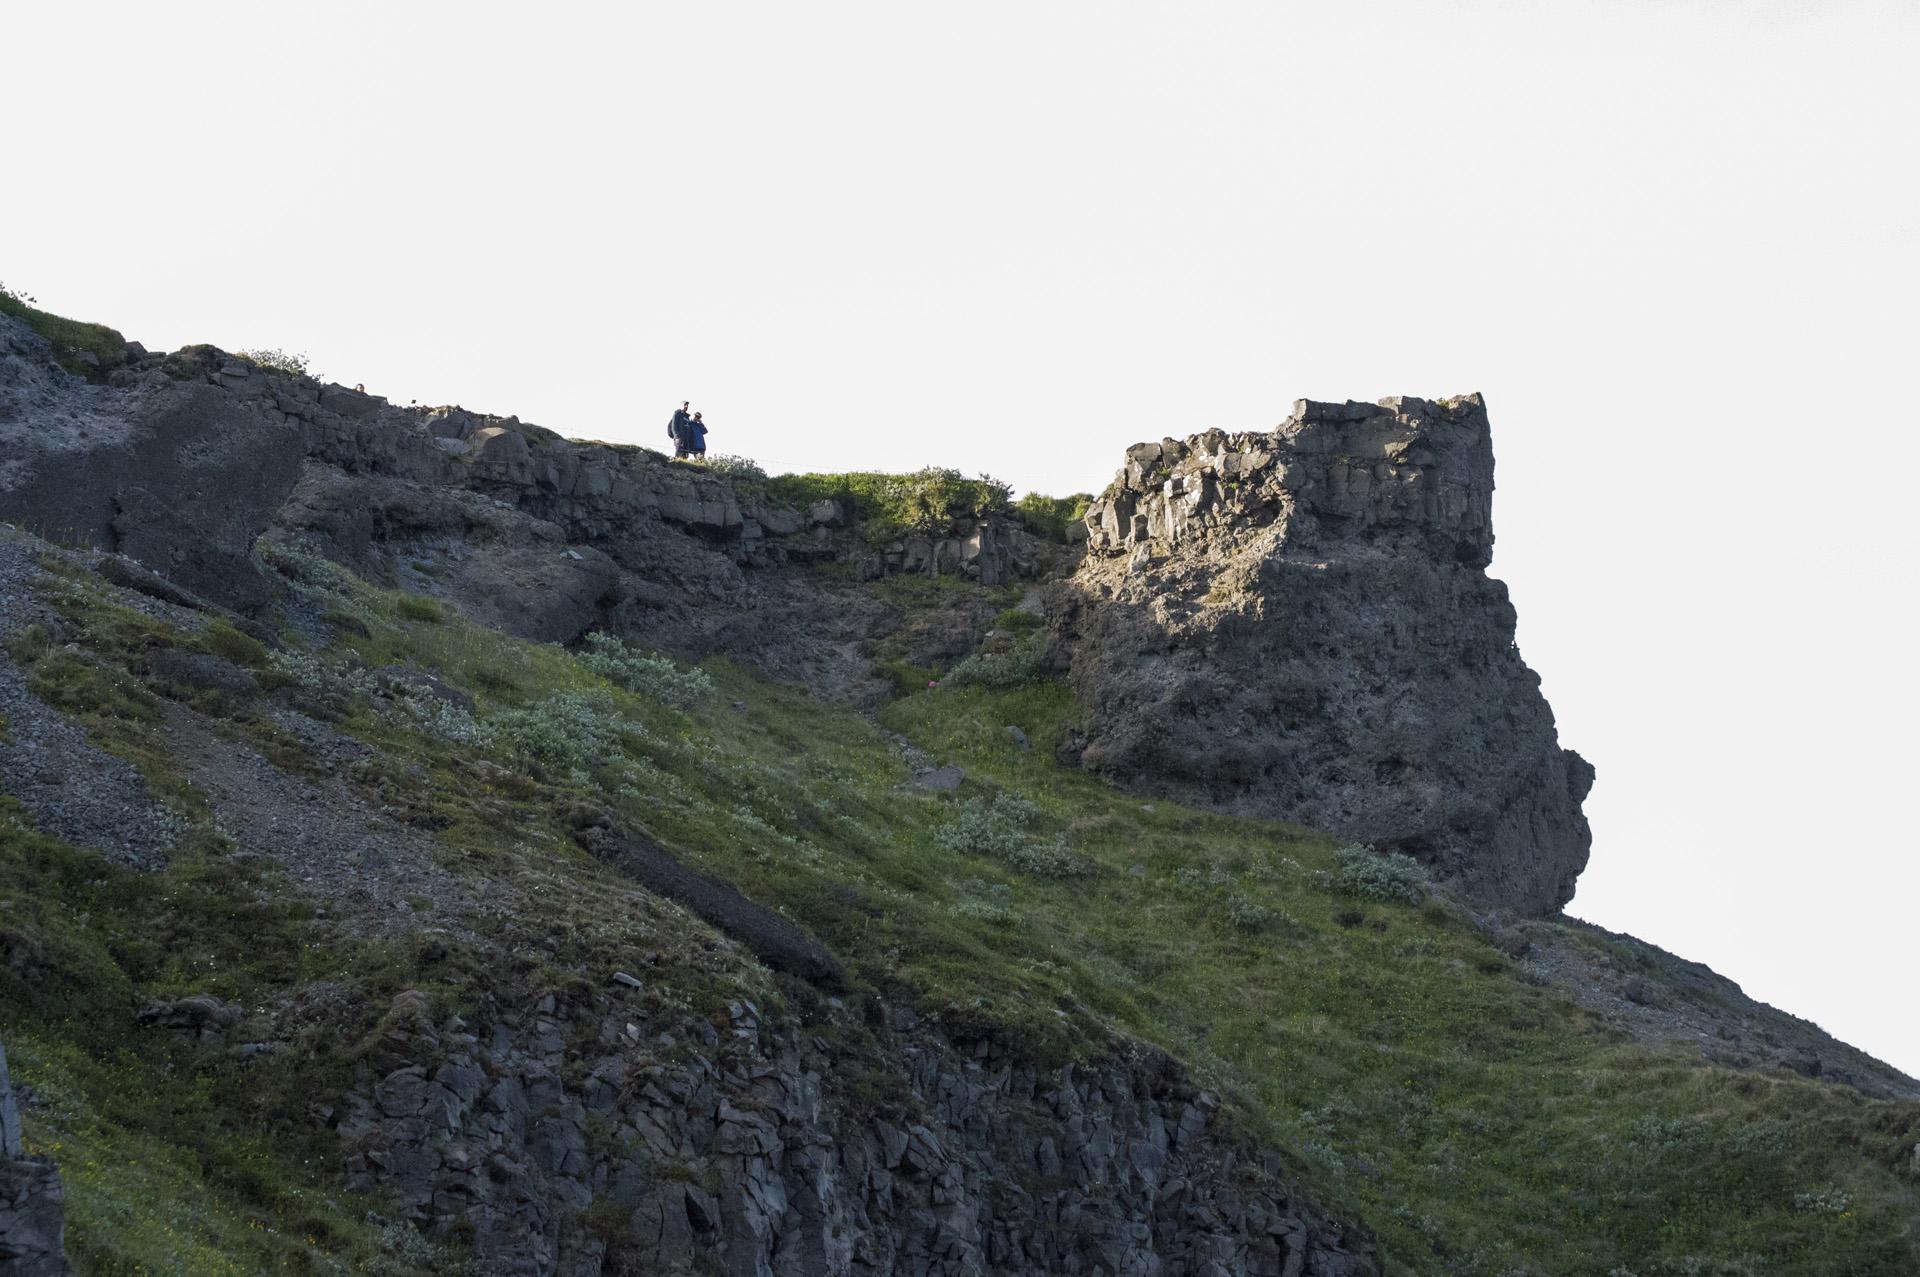 Bluff overlooking Gullfoss waterfall, Suðurland region, Iceland